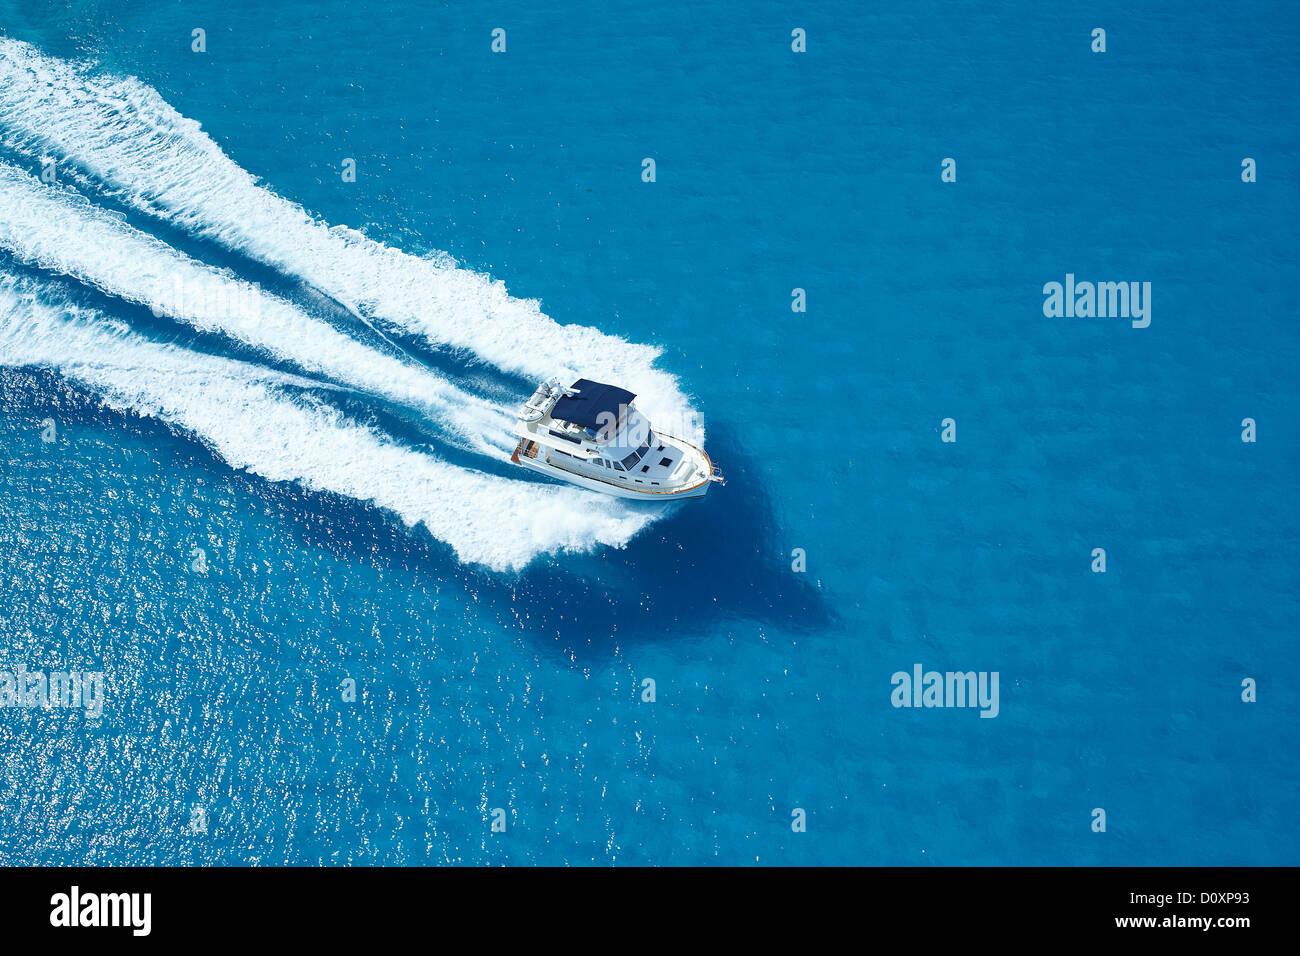 Motor yacht ploughing across blue sea Stock Photo